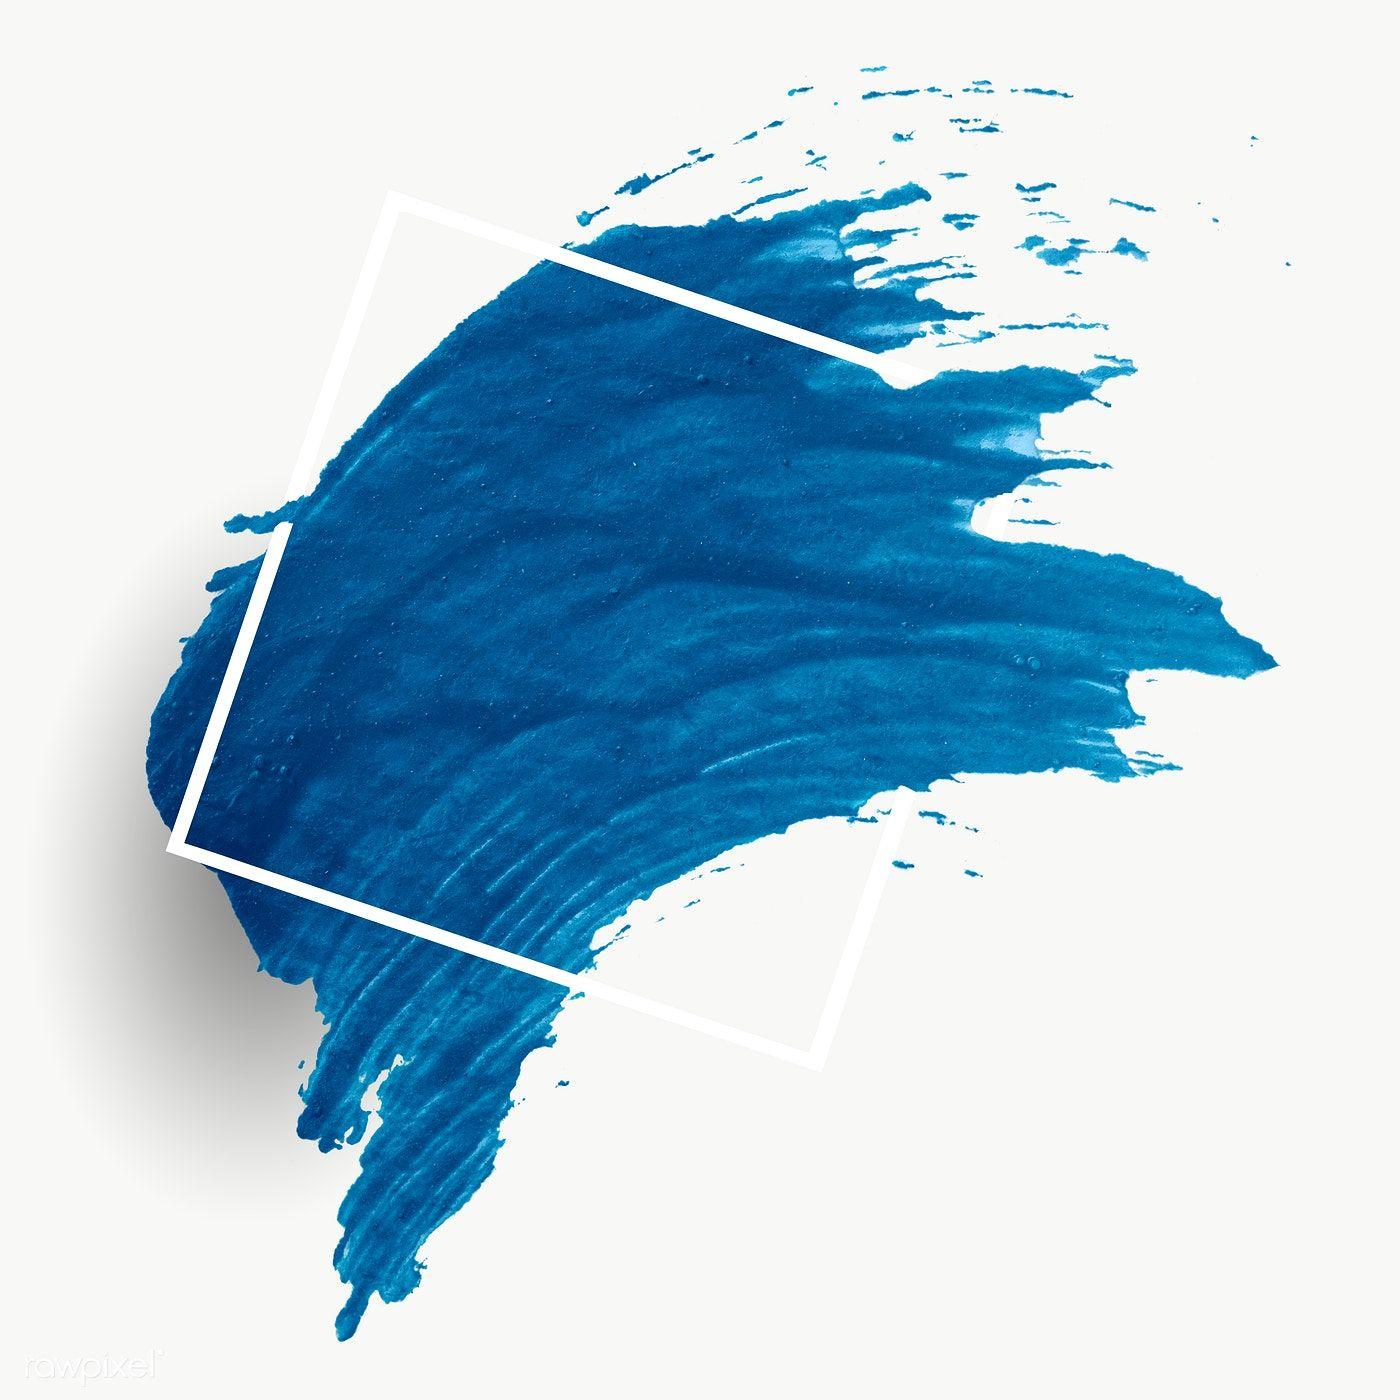 Blue Brush Stroke Banner Transparent Png Free Image By Rawpixel Com Brush Strokes Brush Stroke Png Brush Background